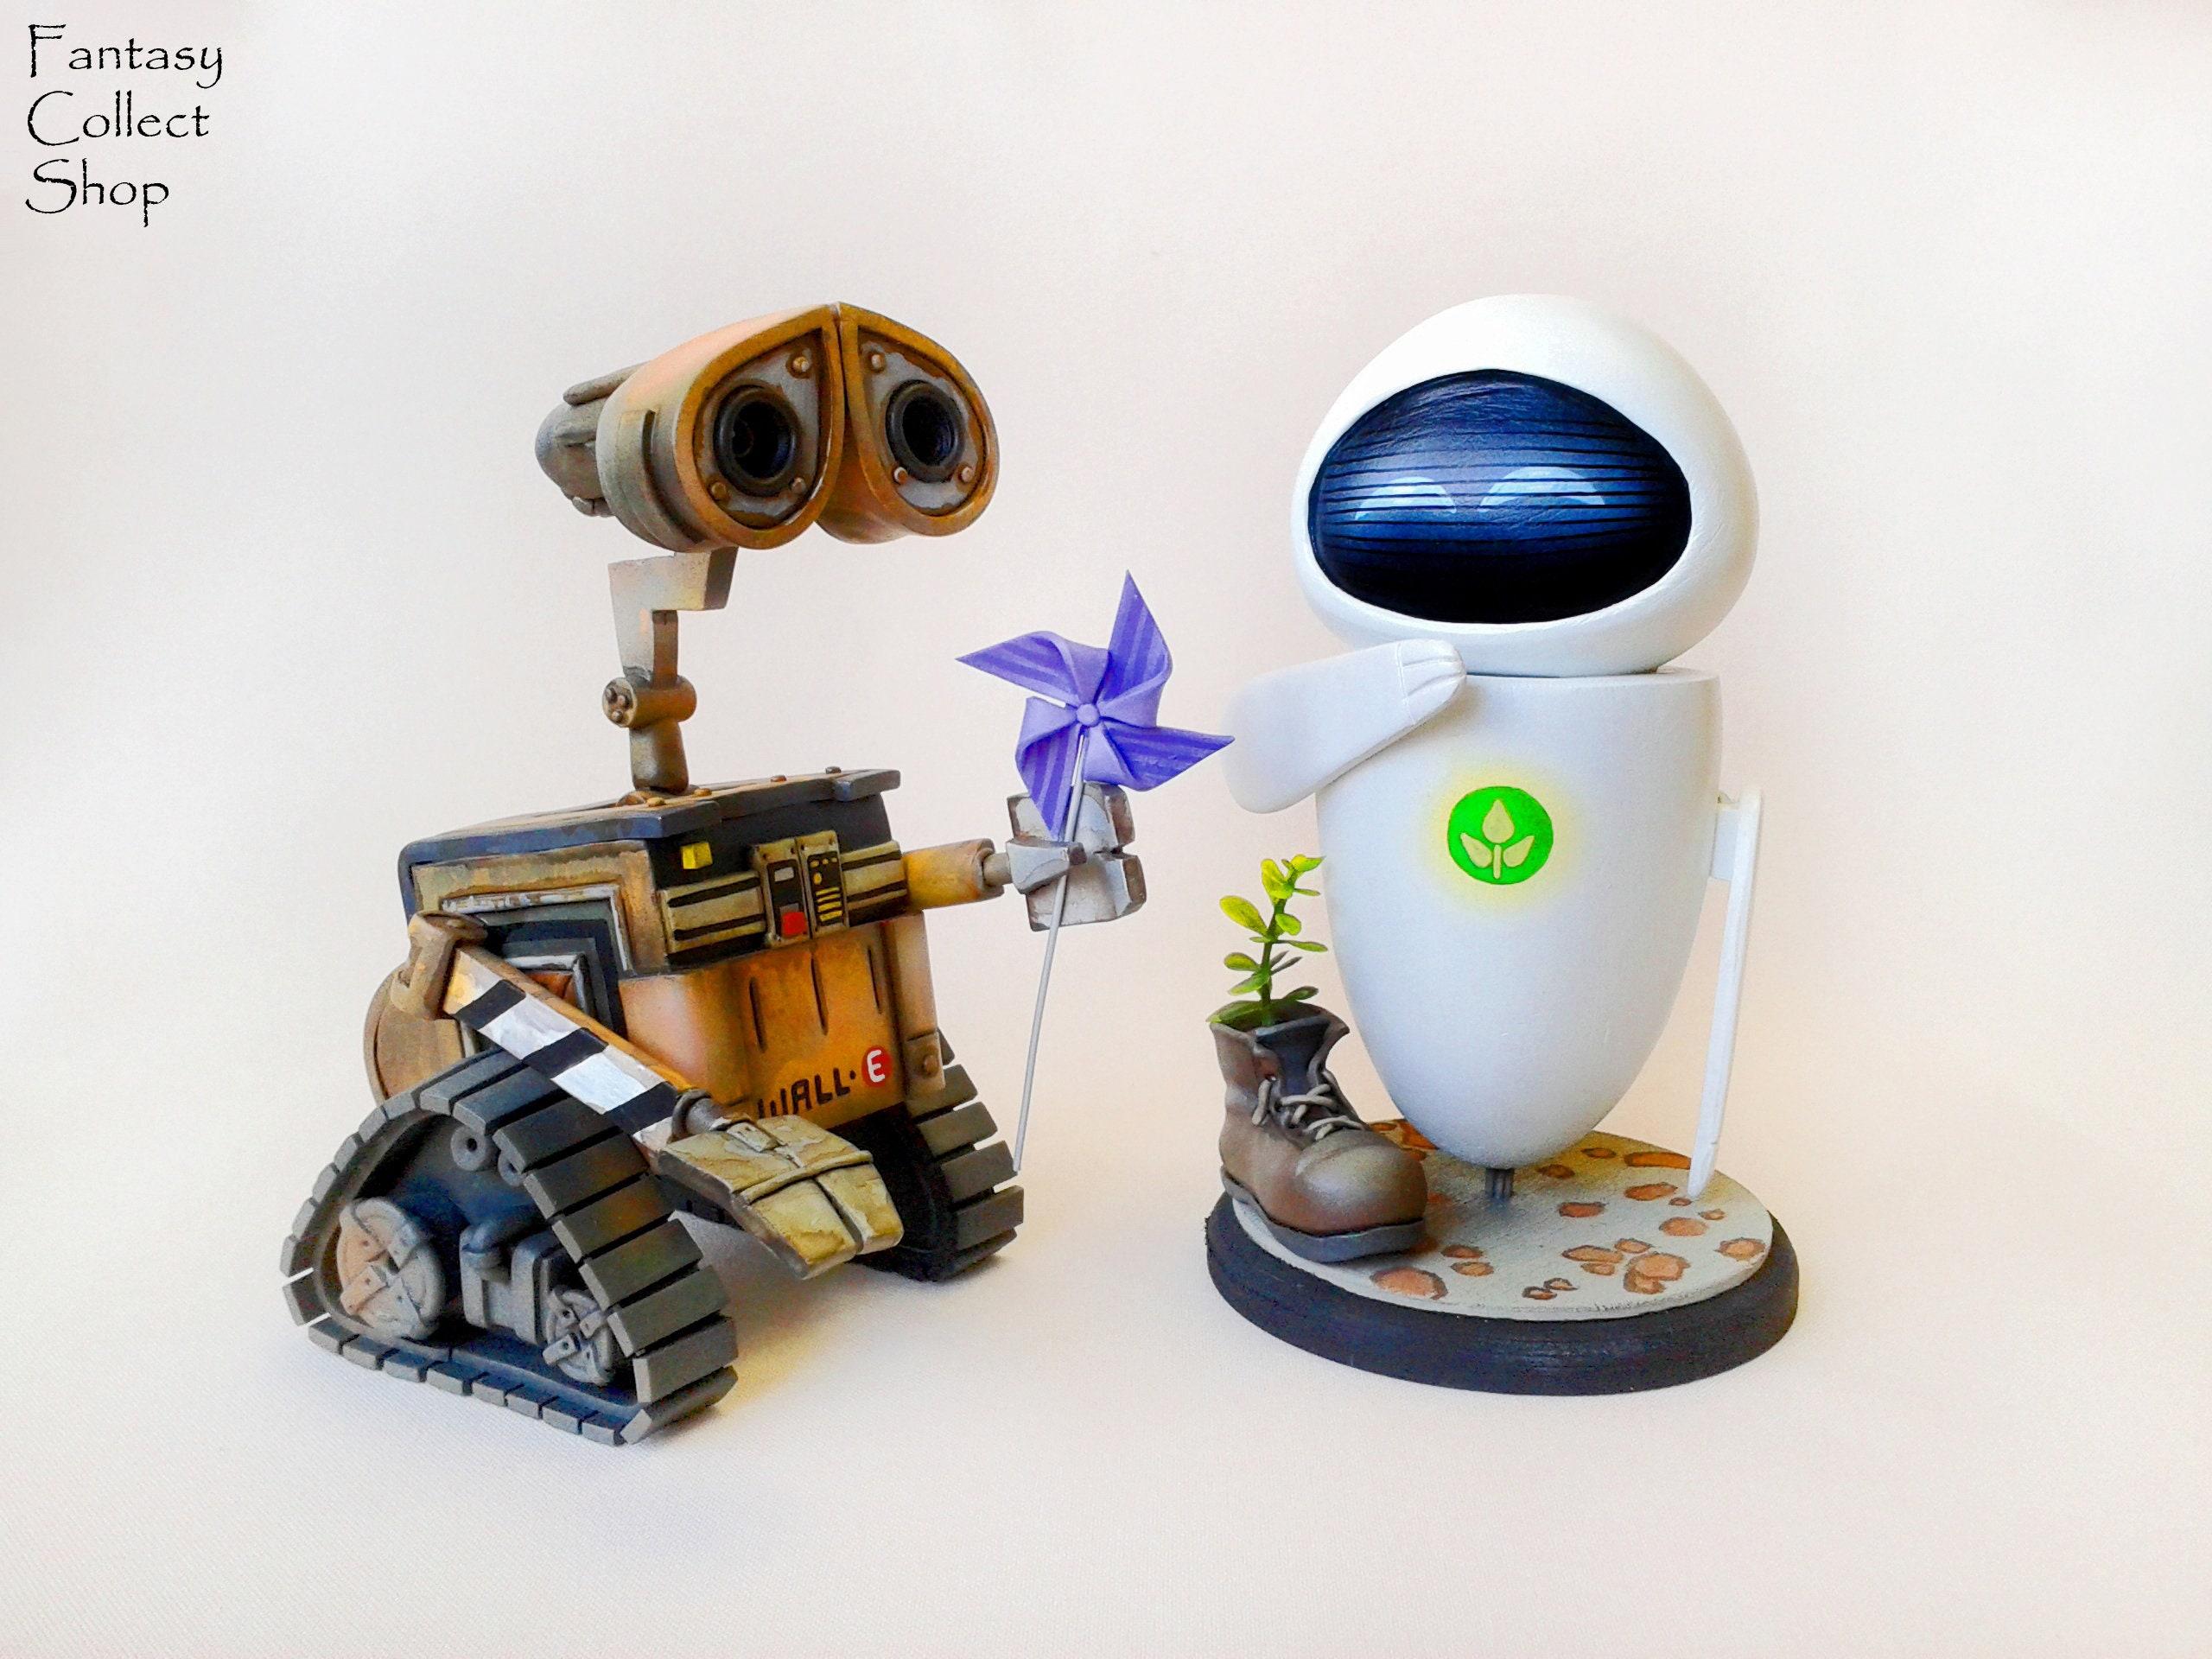 Roboter Wall-E Figur Eva Eve Figur Walle Wallie Wall-E Cartoon